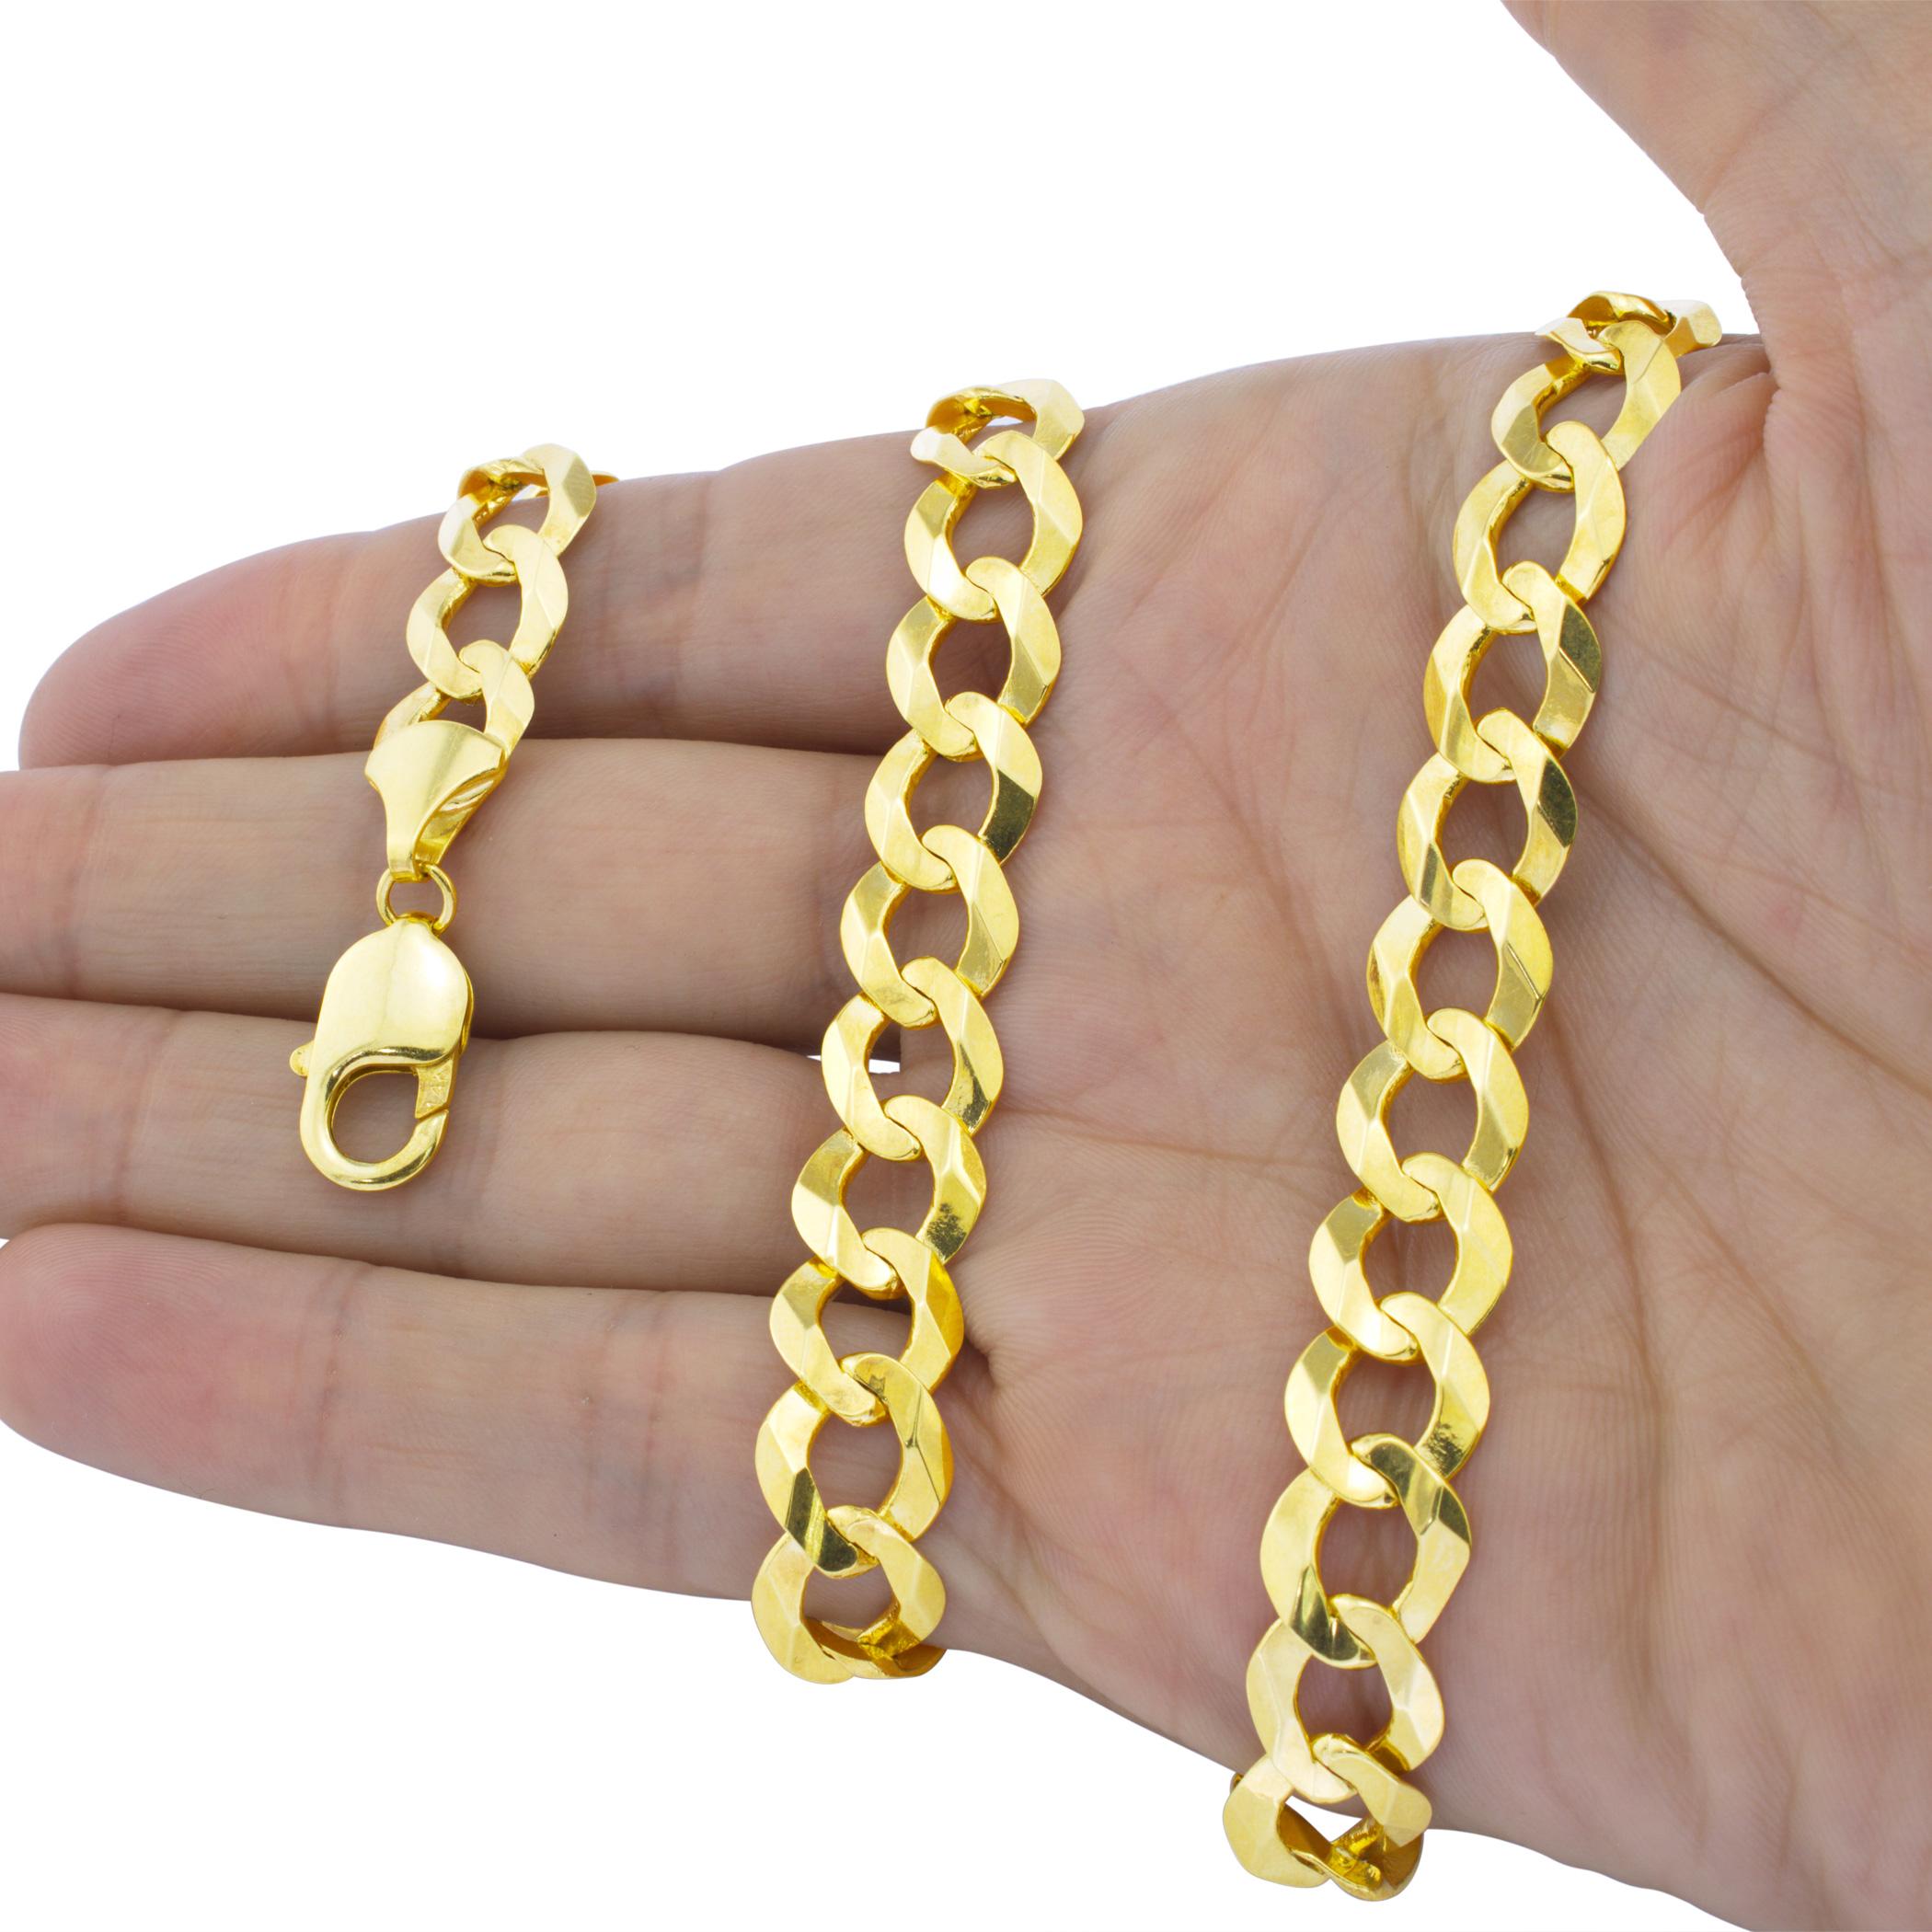 Solid-14K-Yellow-Gold-2-5mm-12mm-Cuban-Curb-Chain-Link-Bracelet-Men-Women-7-034-9-034 thumbnail 9